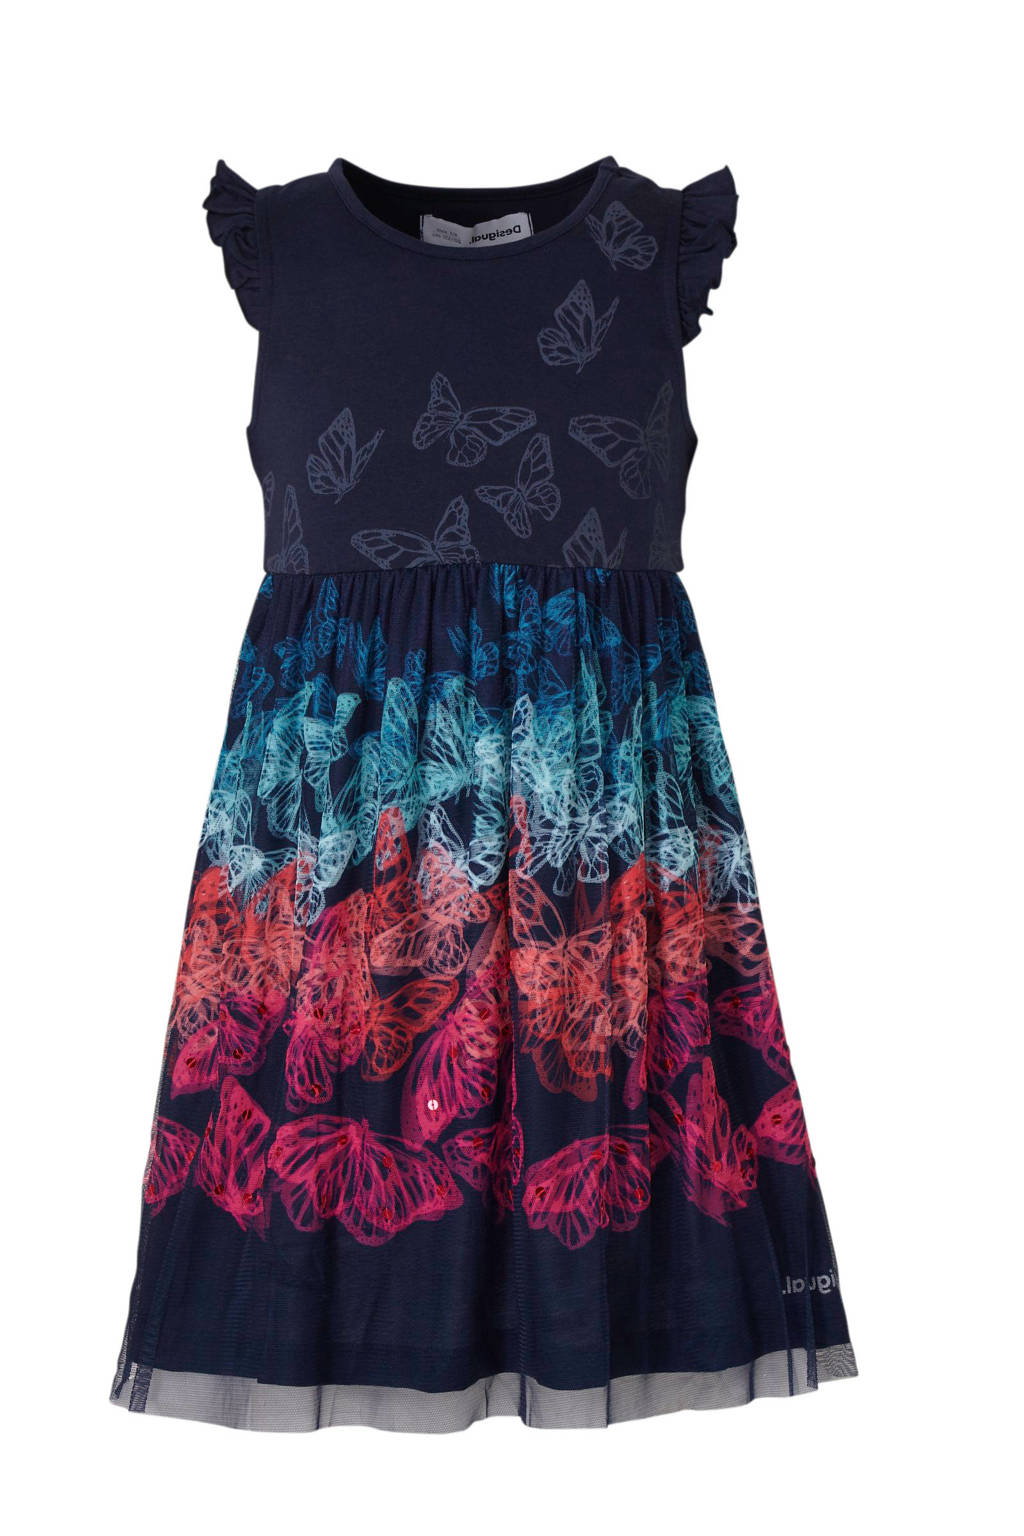 Desigual A-lijn jurk met all over print en pailletten donkerblauw/fuchsia/mintgroen, Donkerblauw/fuchsia/mintgroen